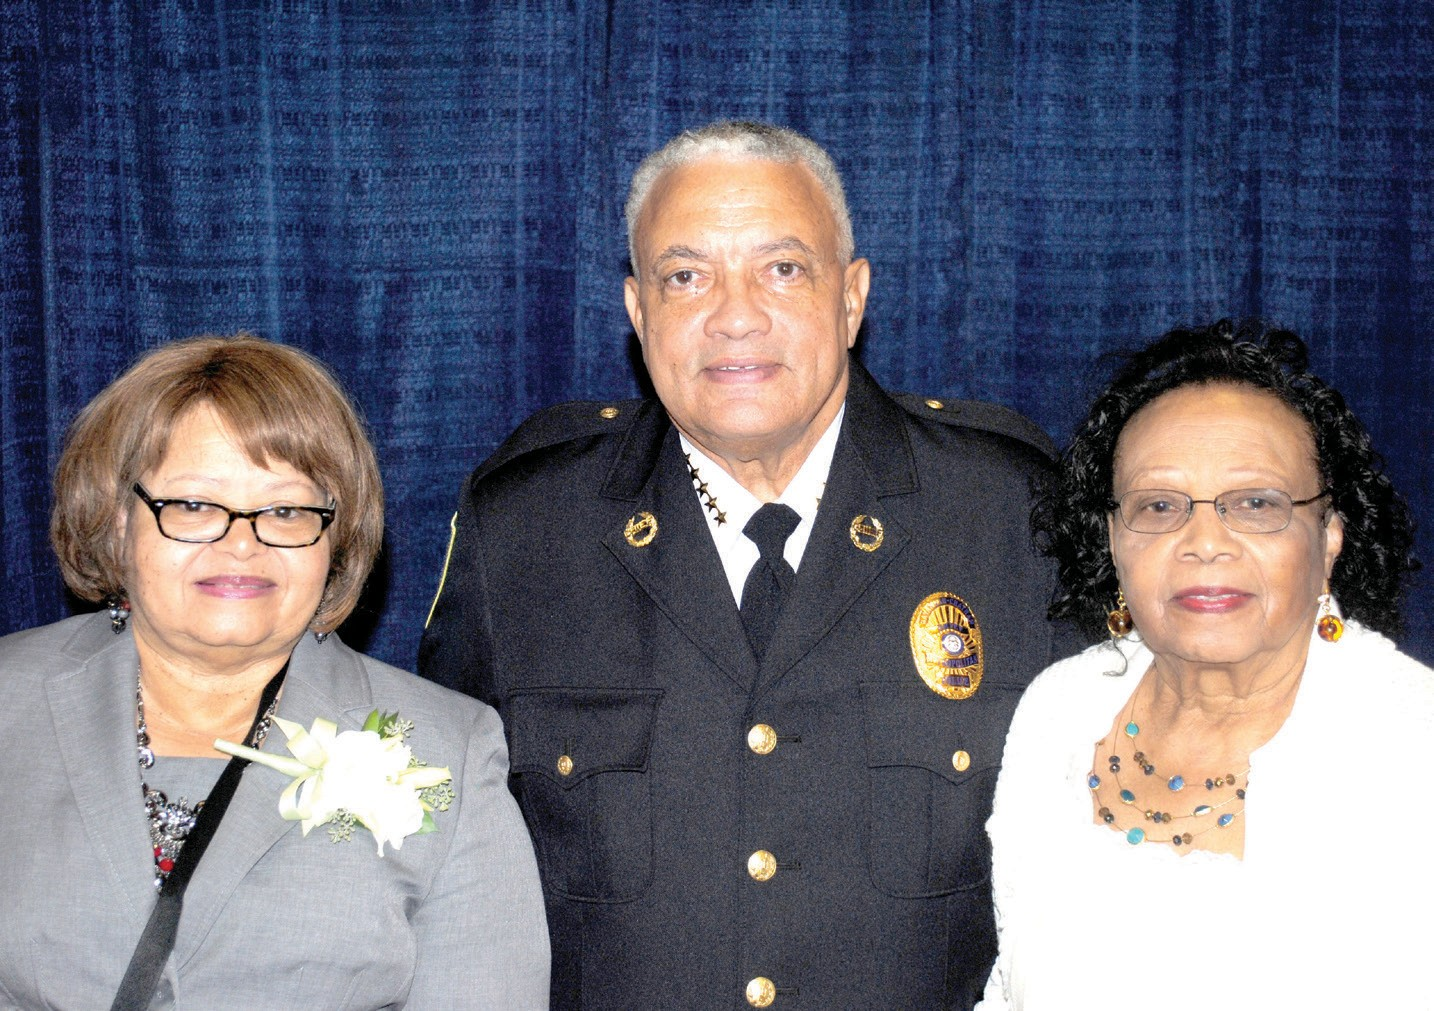 (L-R) Sandra Lumpkin, Chief Joseph Lumpkin, and Mamie Colquitt